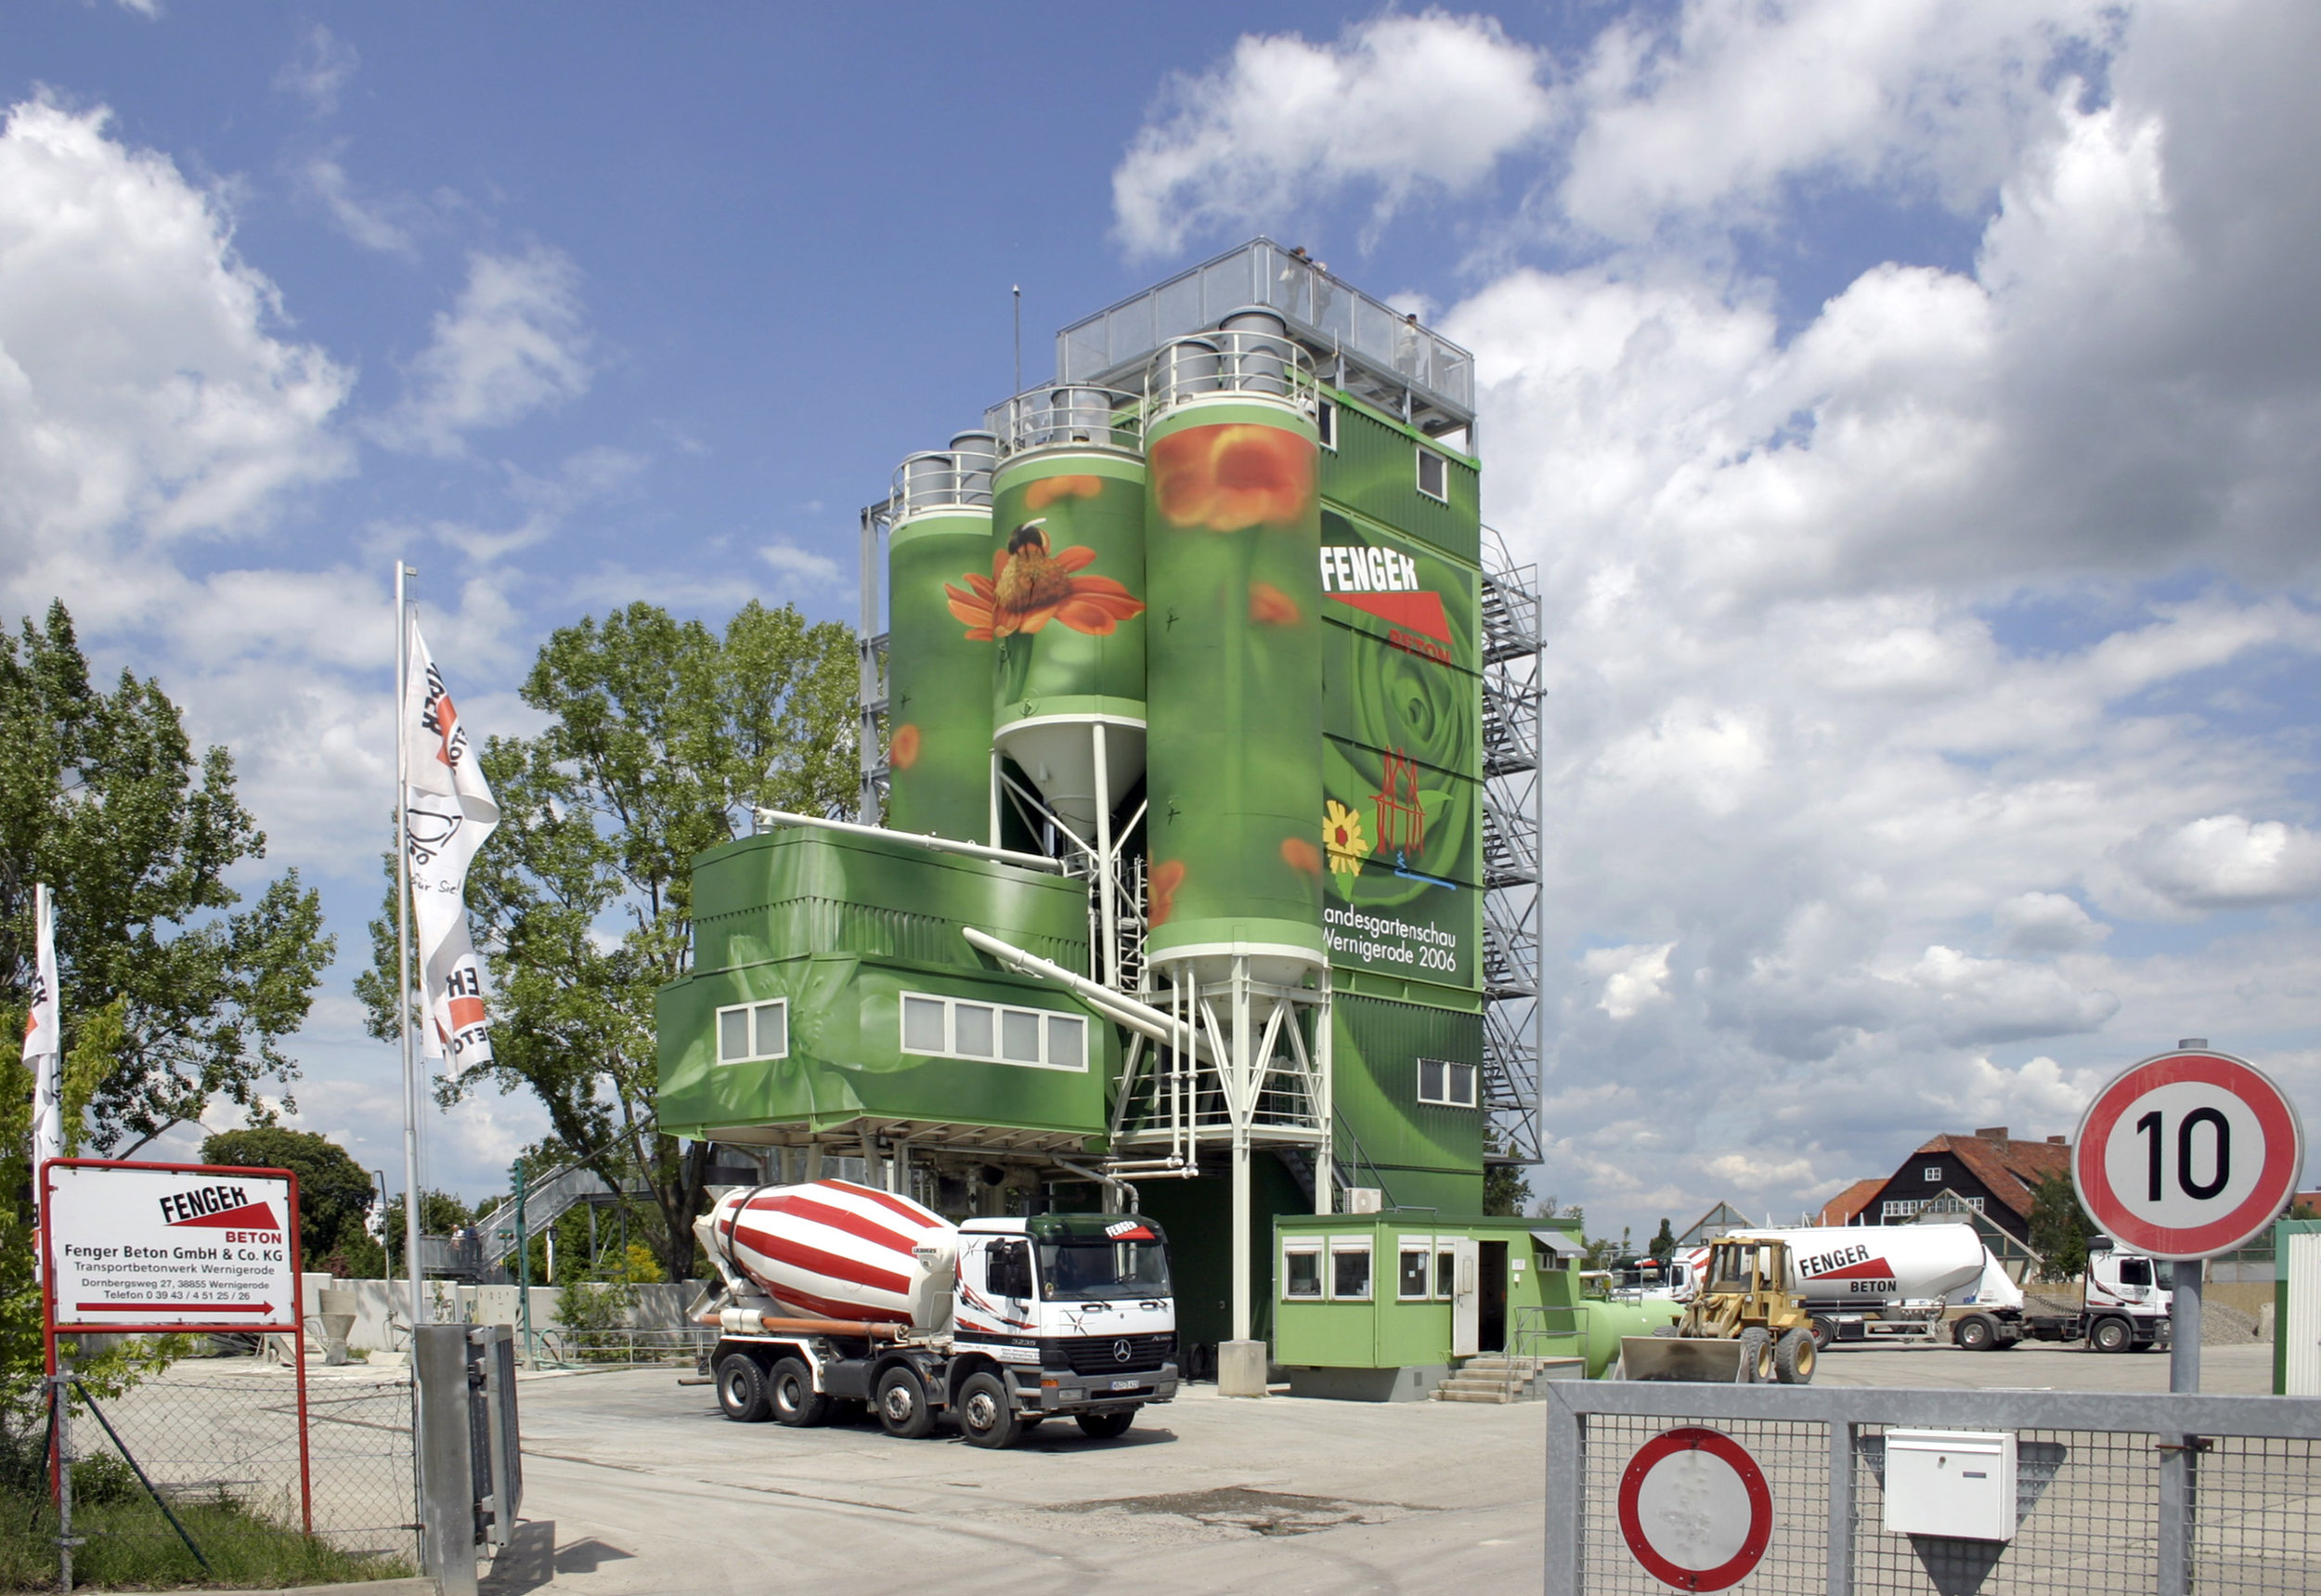 Fassadengestaltung-Industrie-Wernigerode-betonwerk-silos-gruen.jpg